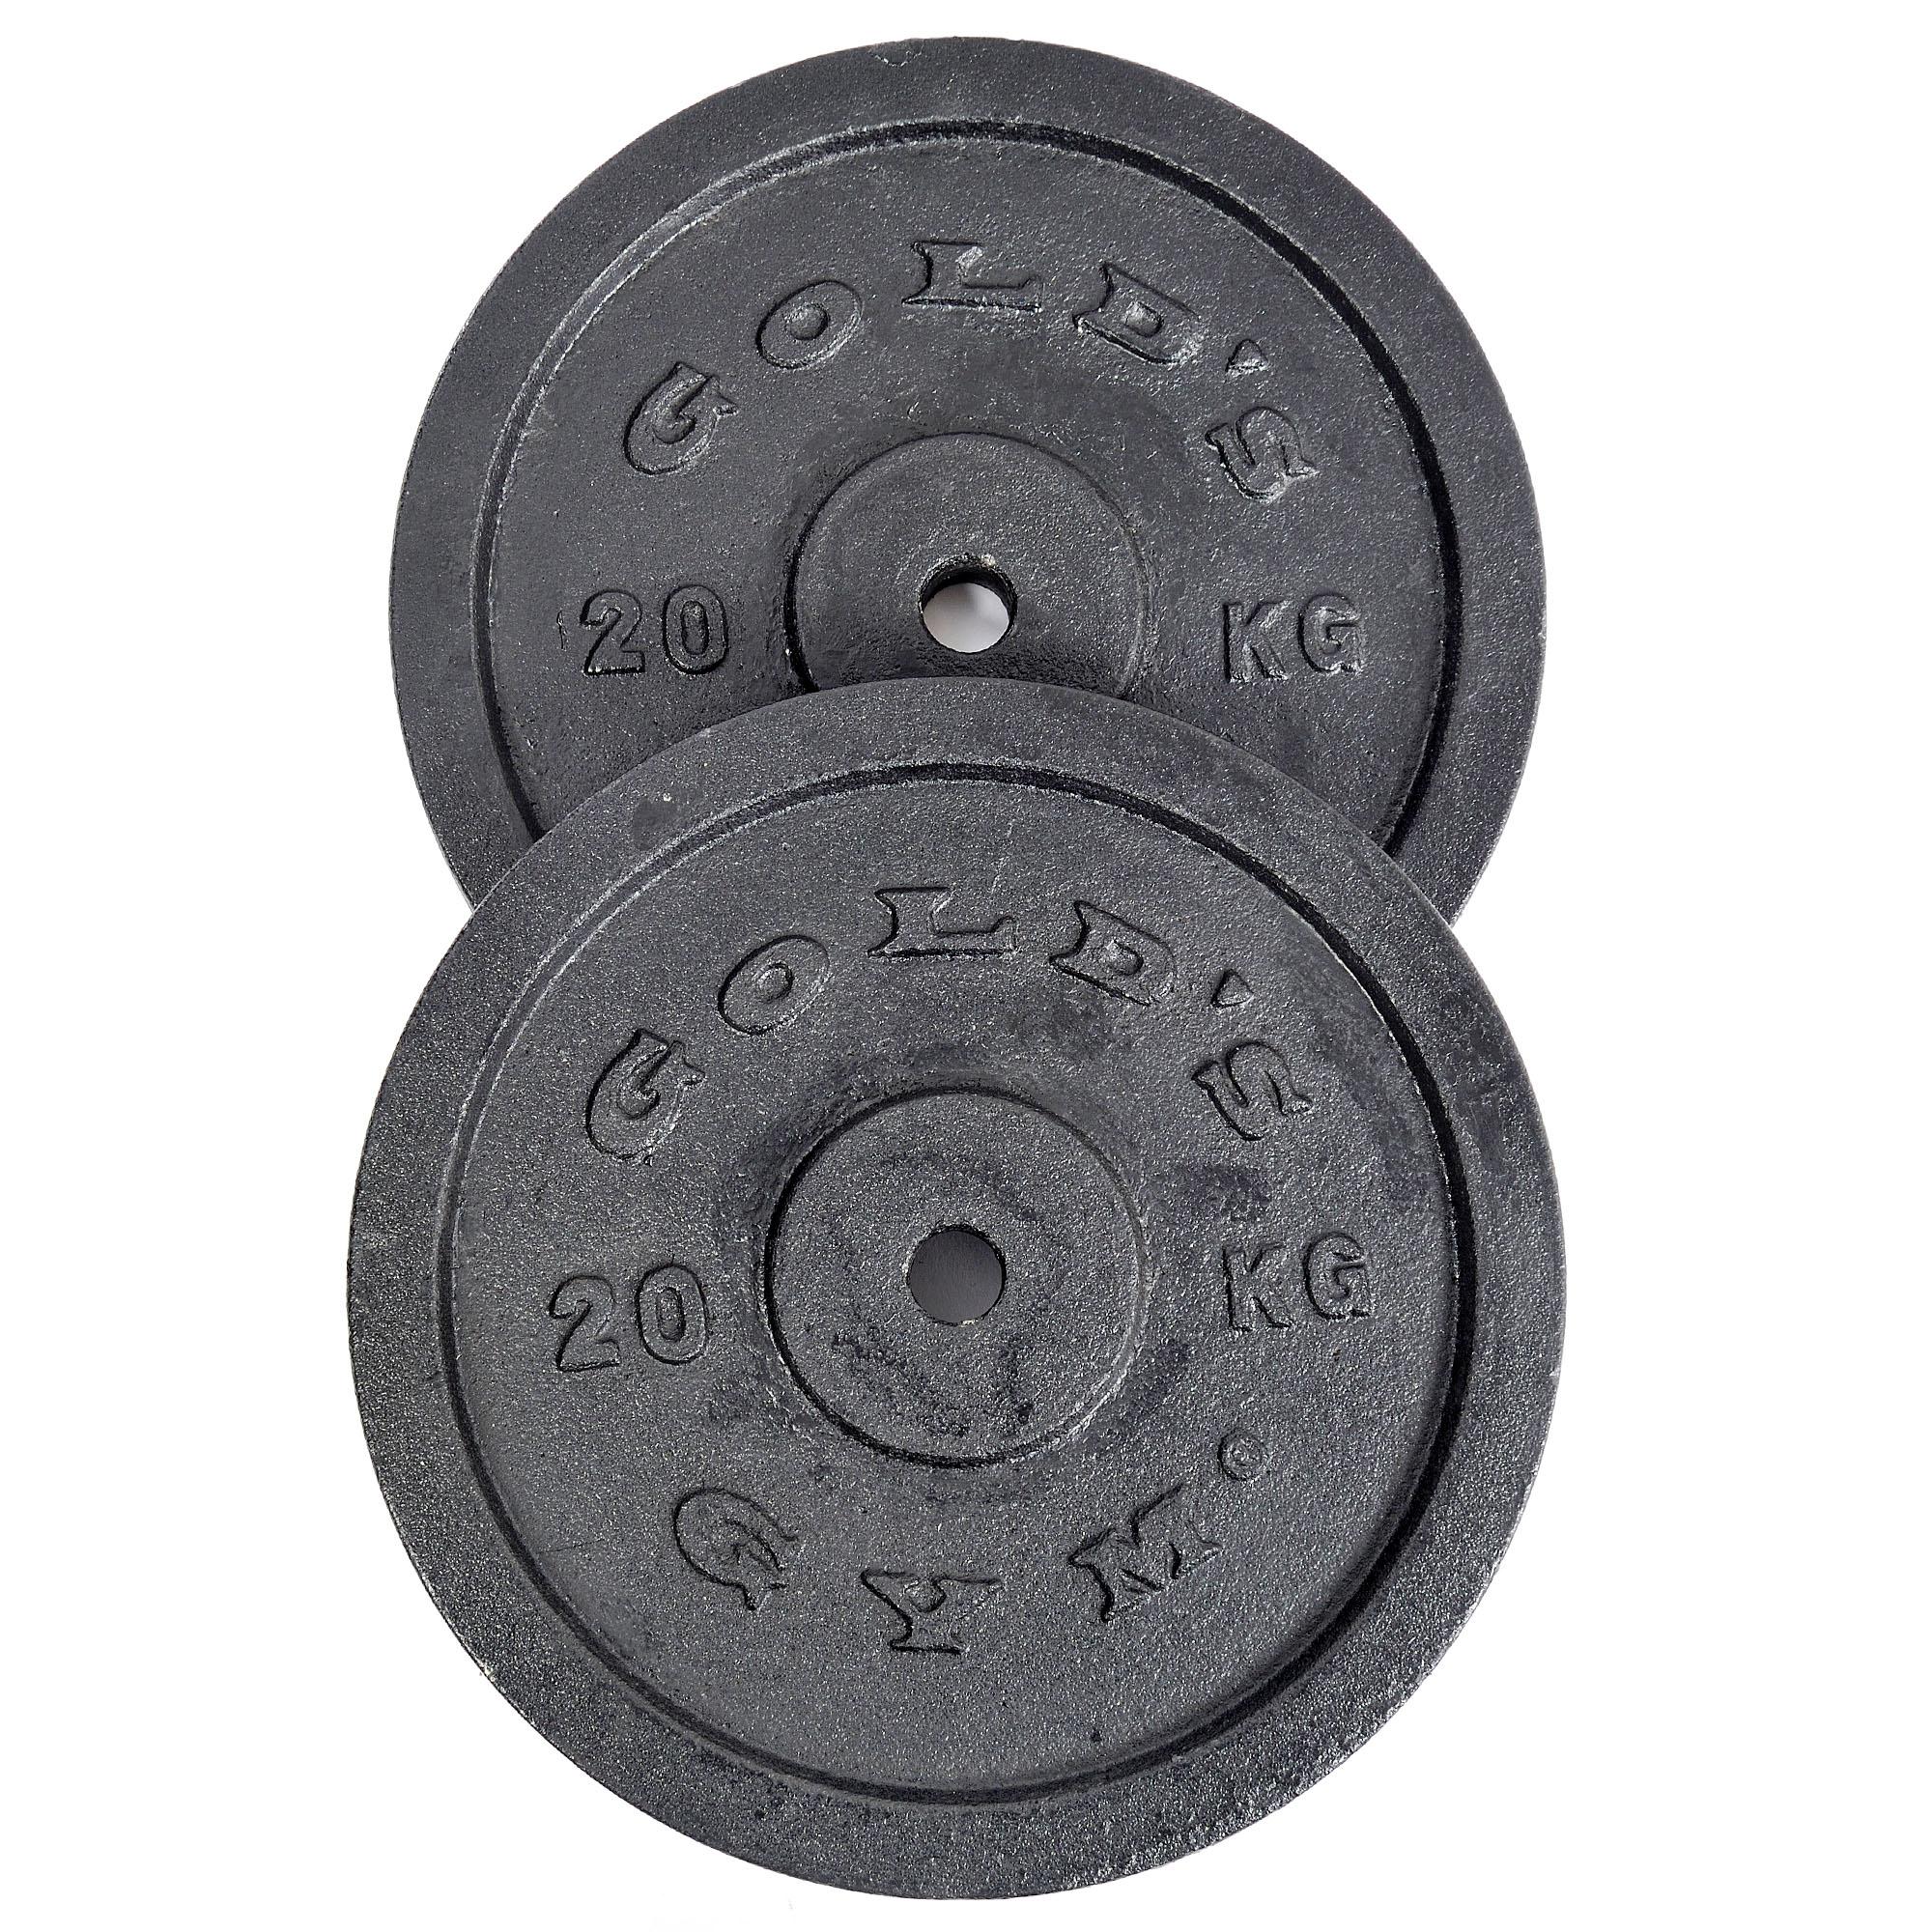 Fitness Equipment Golds Gym 2 x 20kg Cast Iron Standard Weight Plates